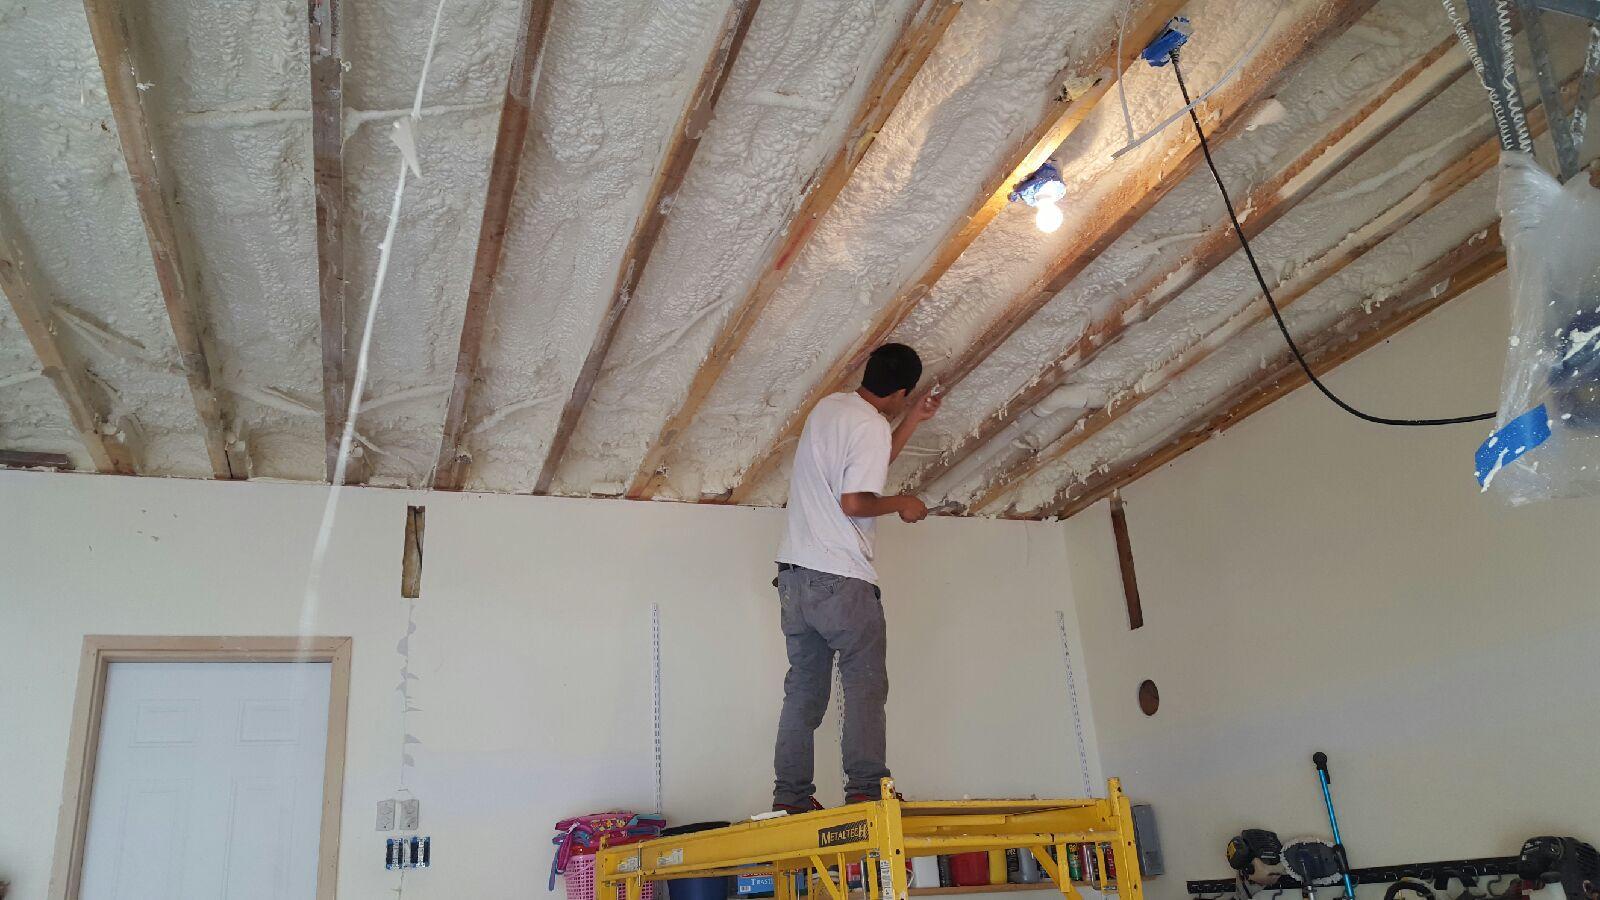 Spray Foam Garage Ceiling - After Photo